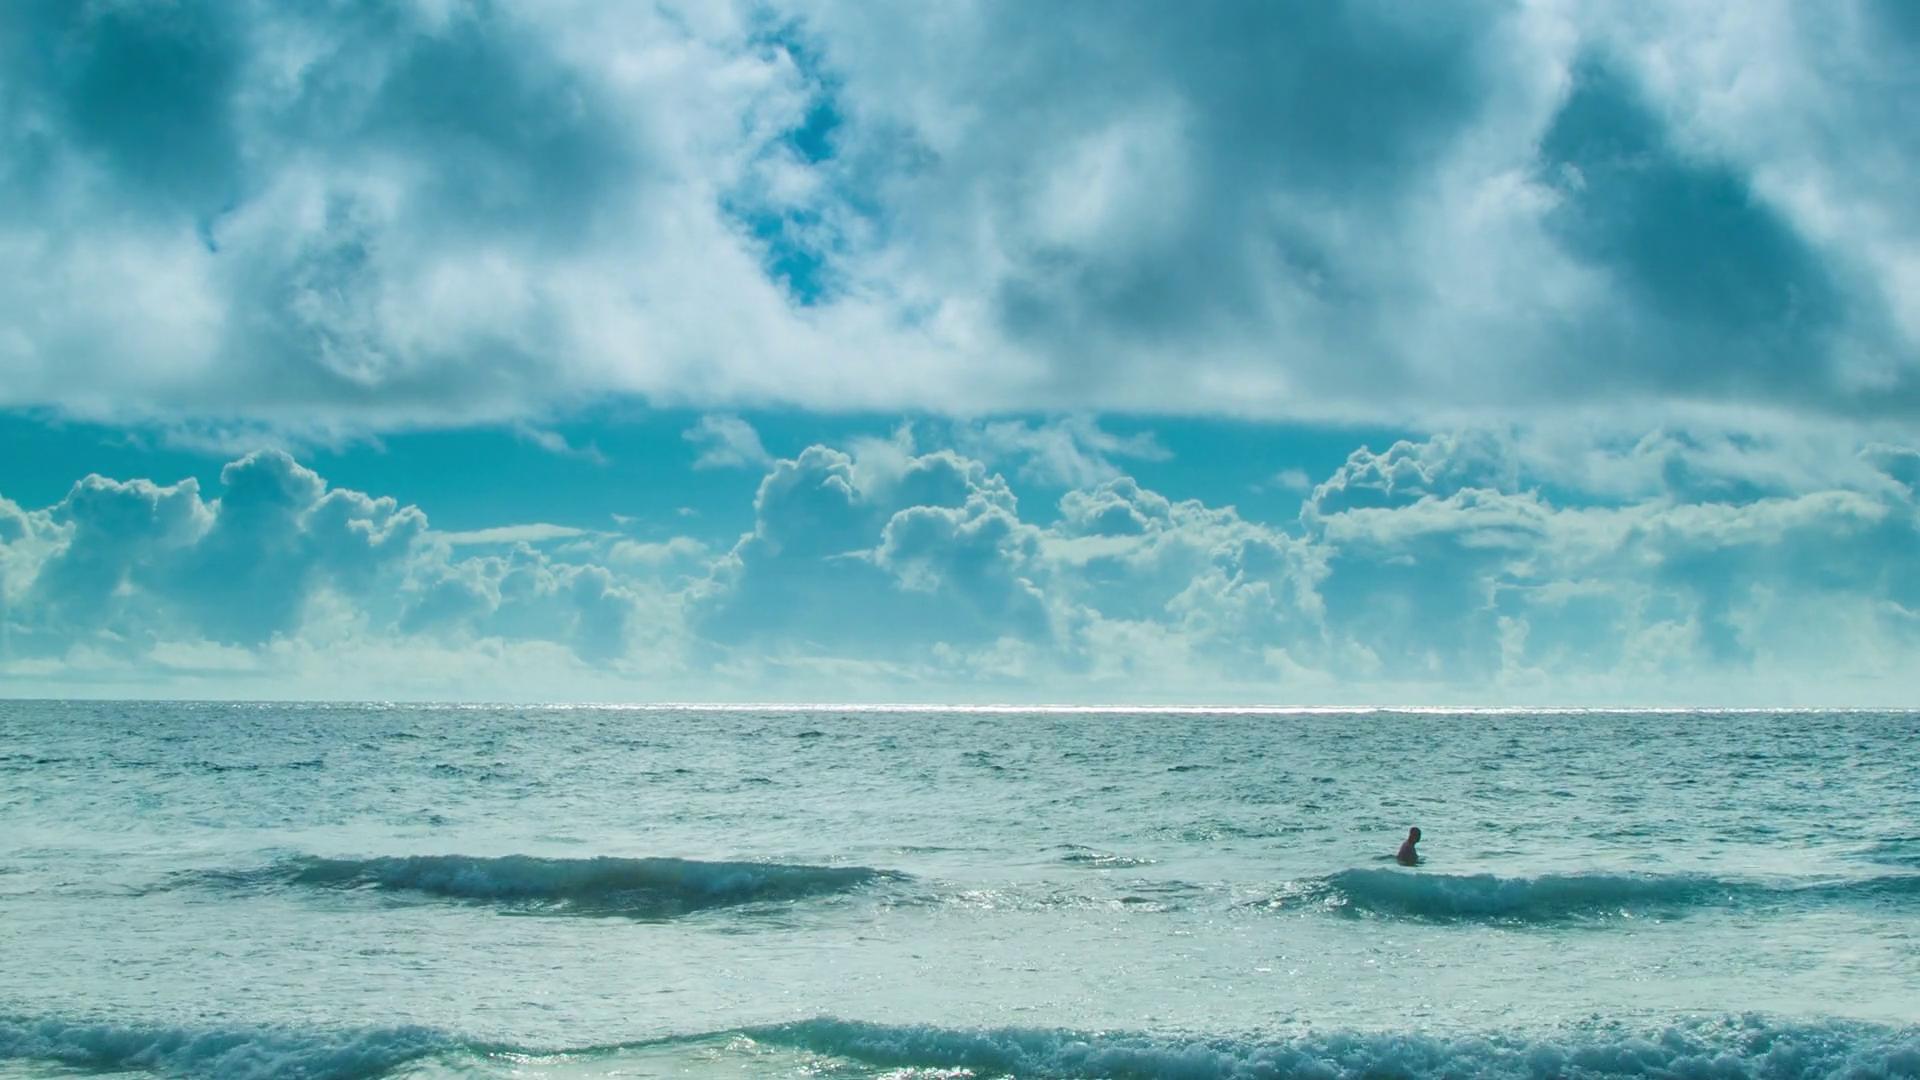 Man Swimming Alone in a Vast Ocean in the Bermuda Triangle in 1920x1080